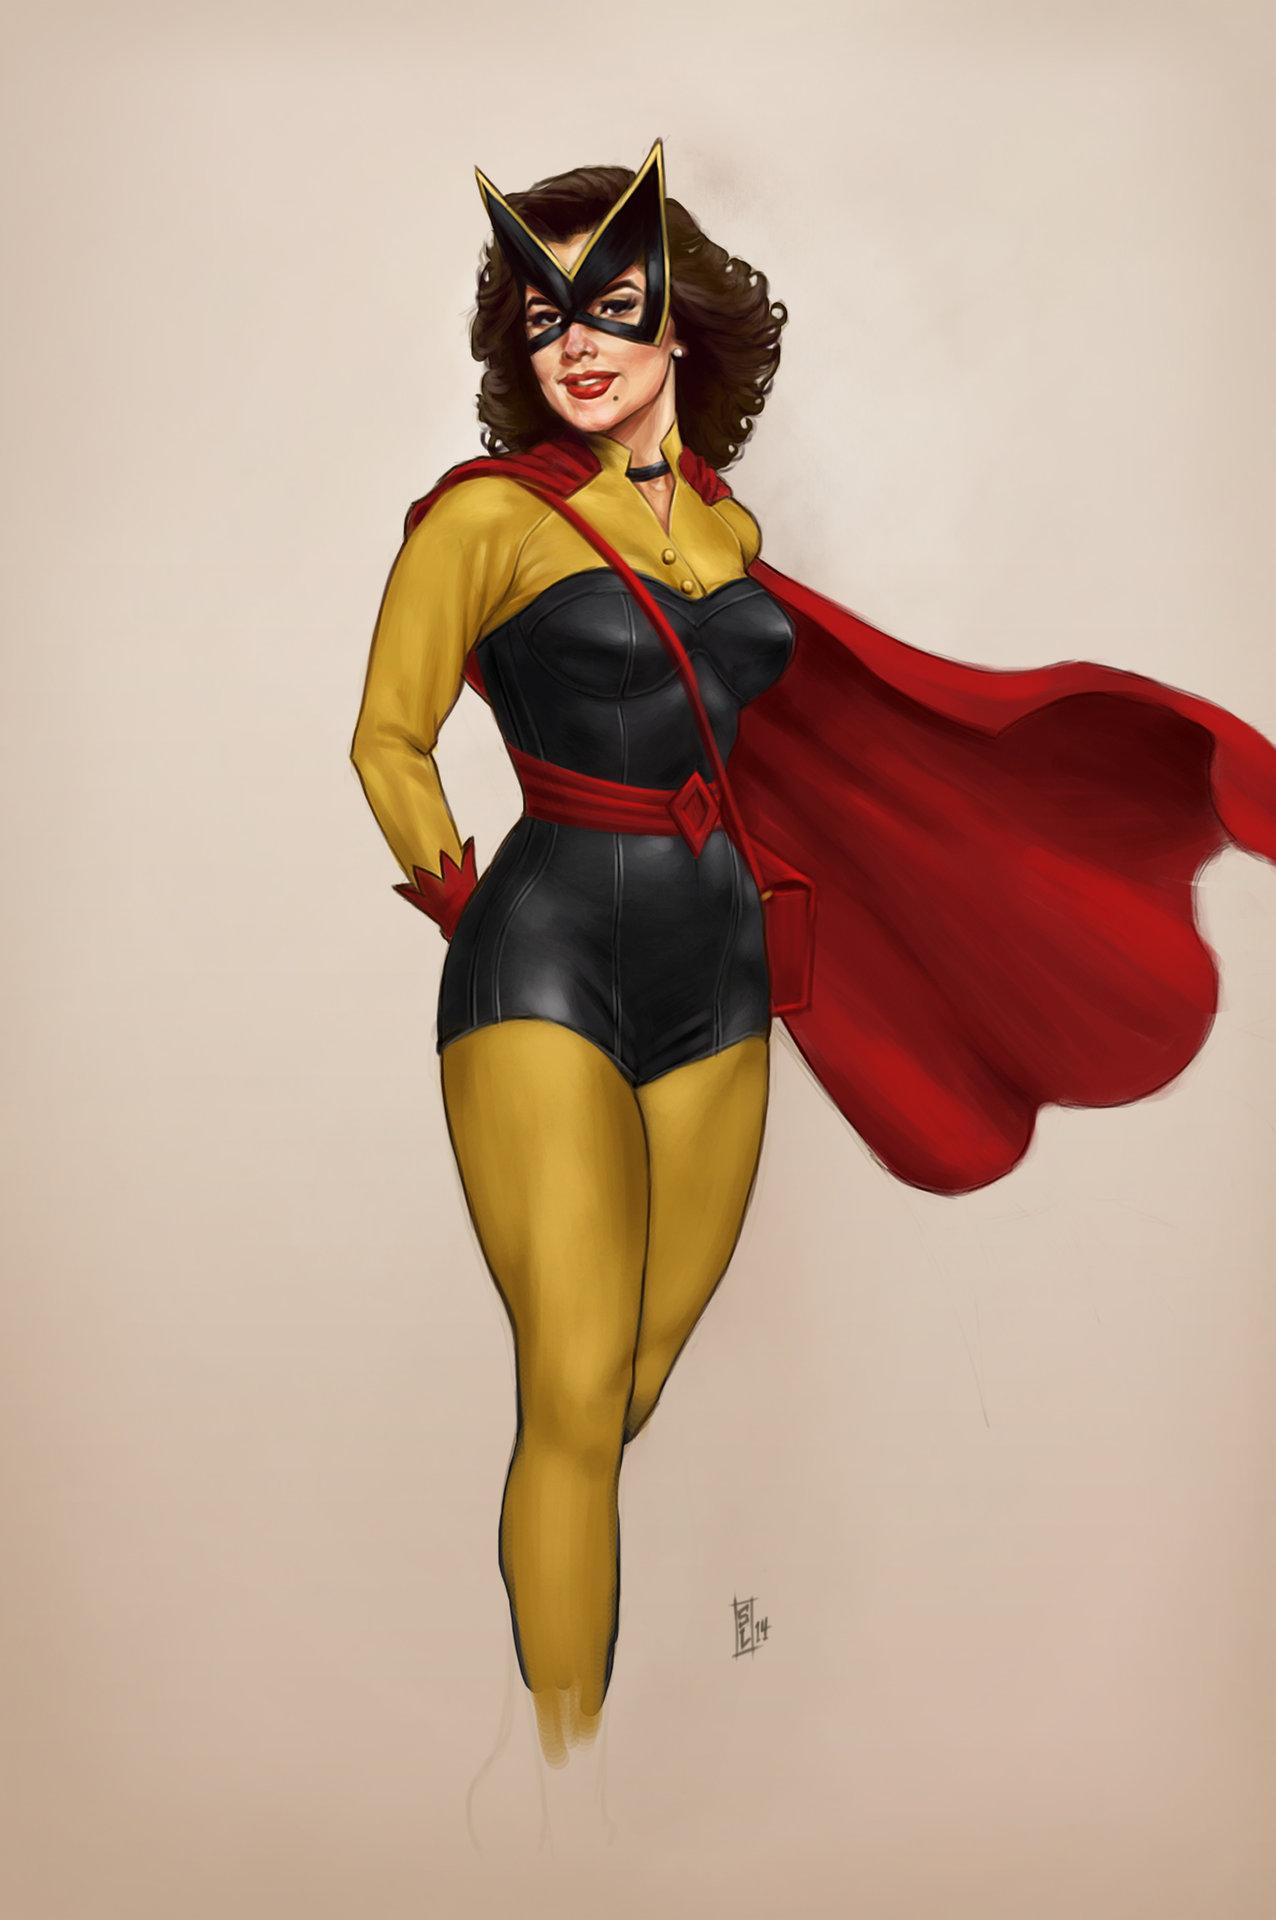 Картинки супергероев женщина